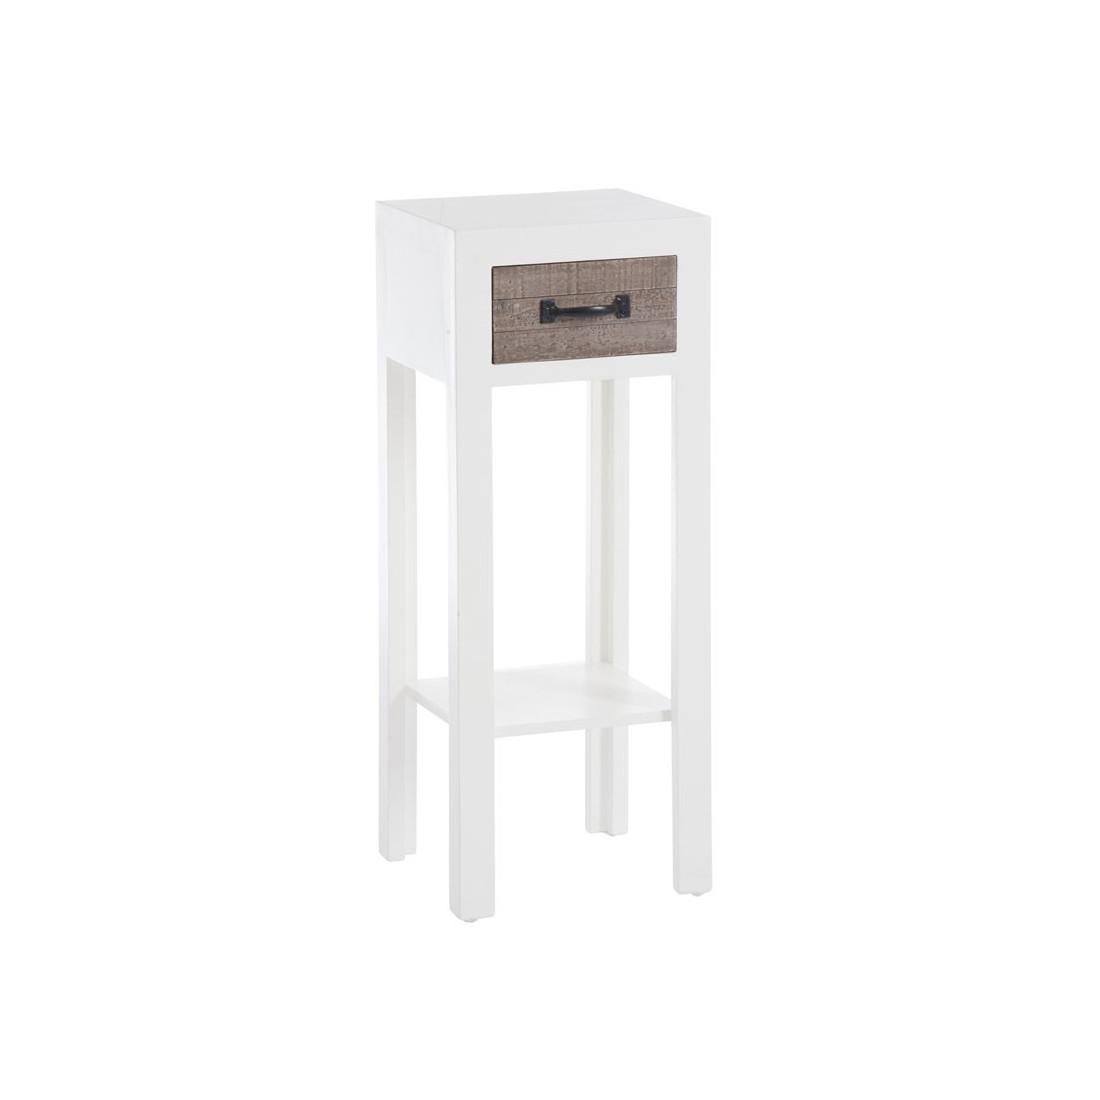 Sellette 1 tiroir bois blanc et naturel canon univers for Petit meuble blanc a tiroir